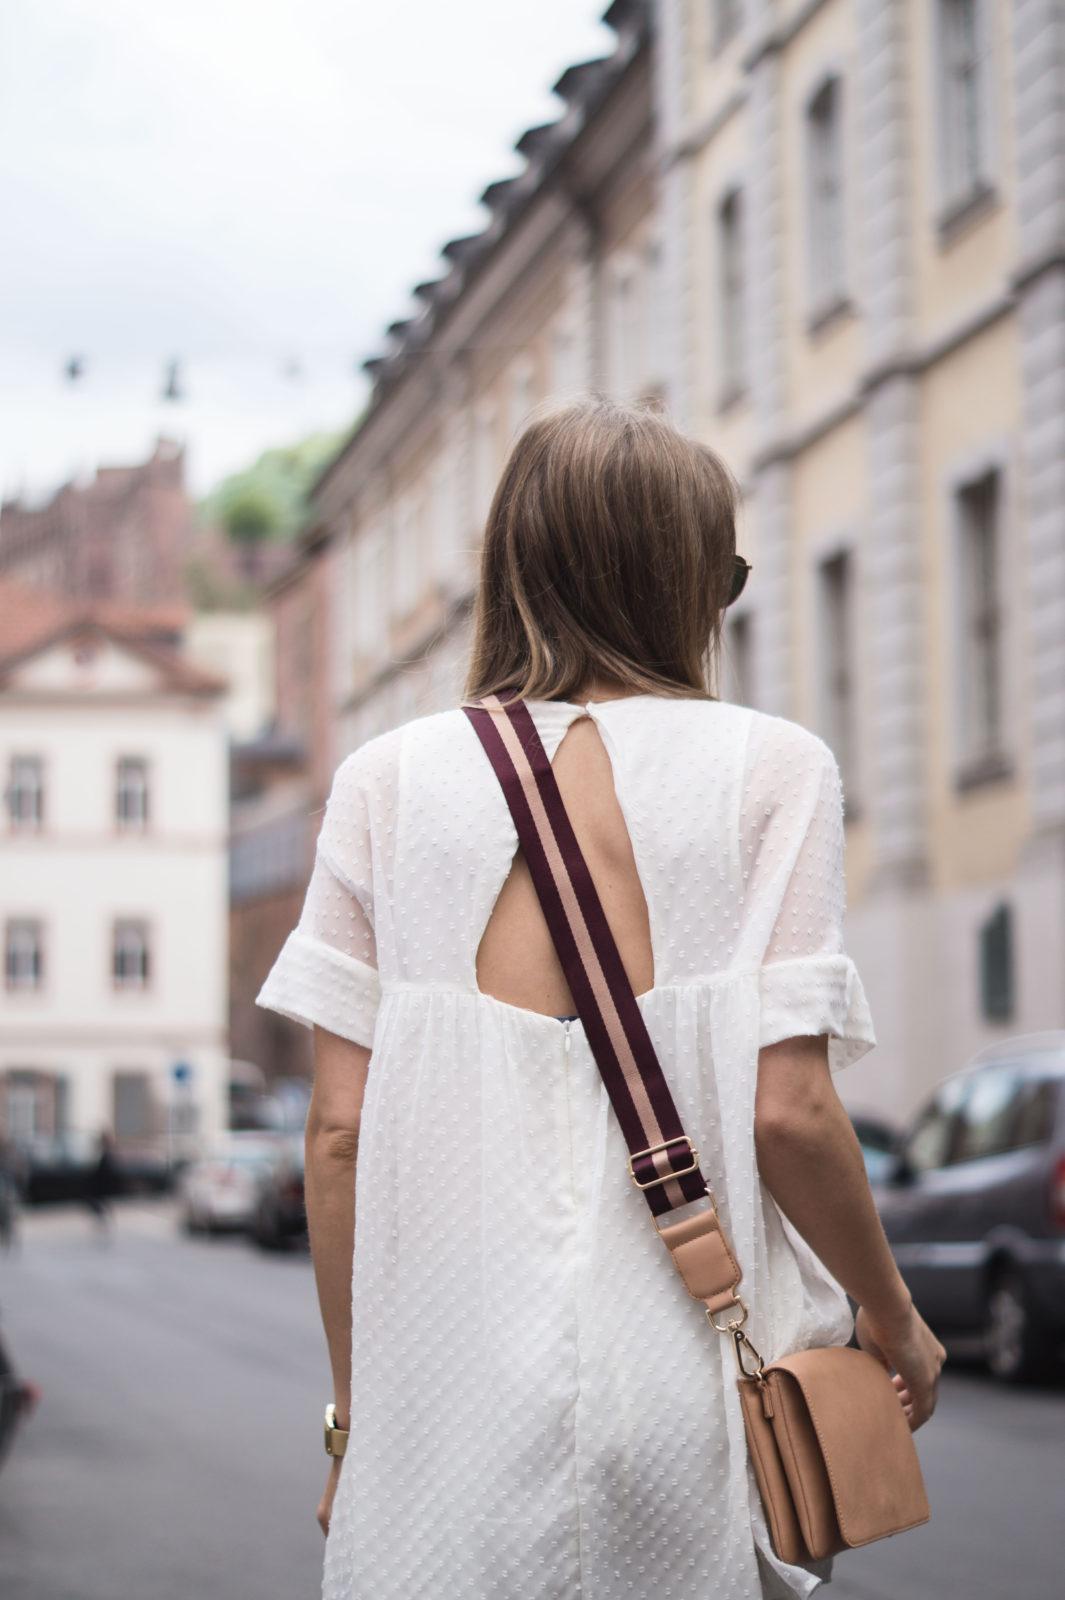 Floral Summer Dress Zara Jumpsuit Black Loafers Pantoletten Sommerkleid Streetstyle Heidelberg Sariety Modeblog Streetstyle Details